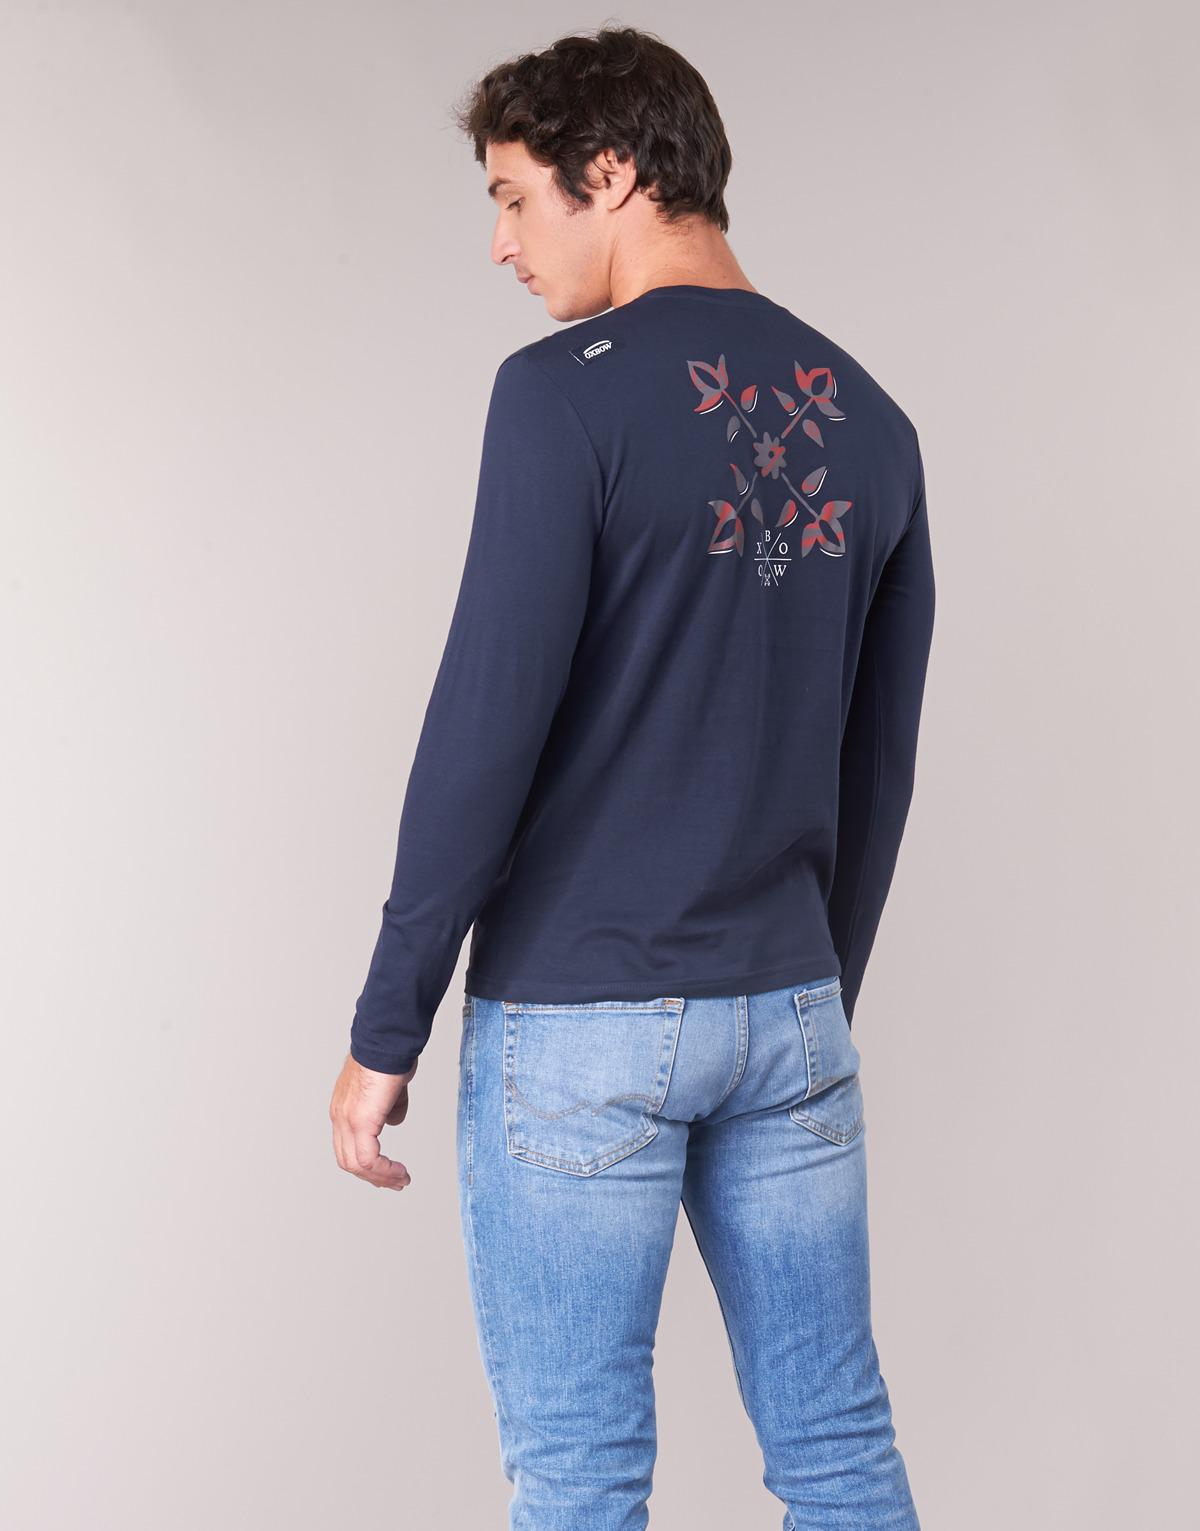 OXBOW Herren T-Shirt M1traz